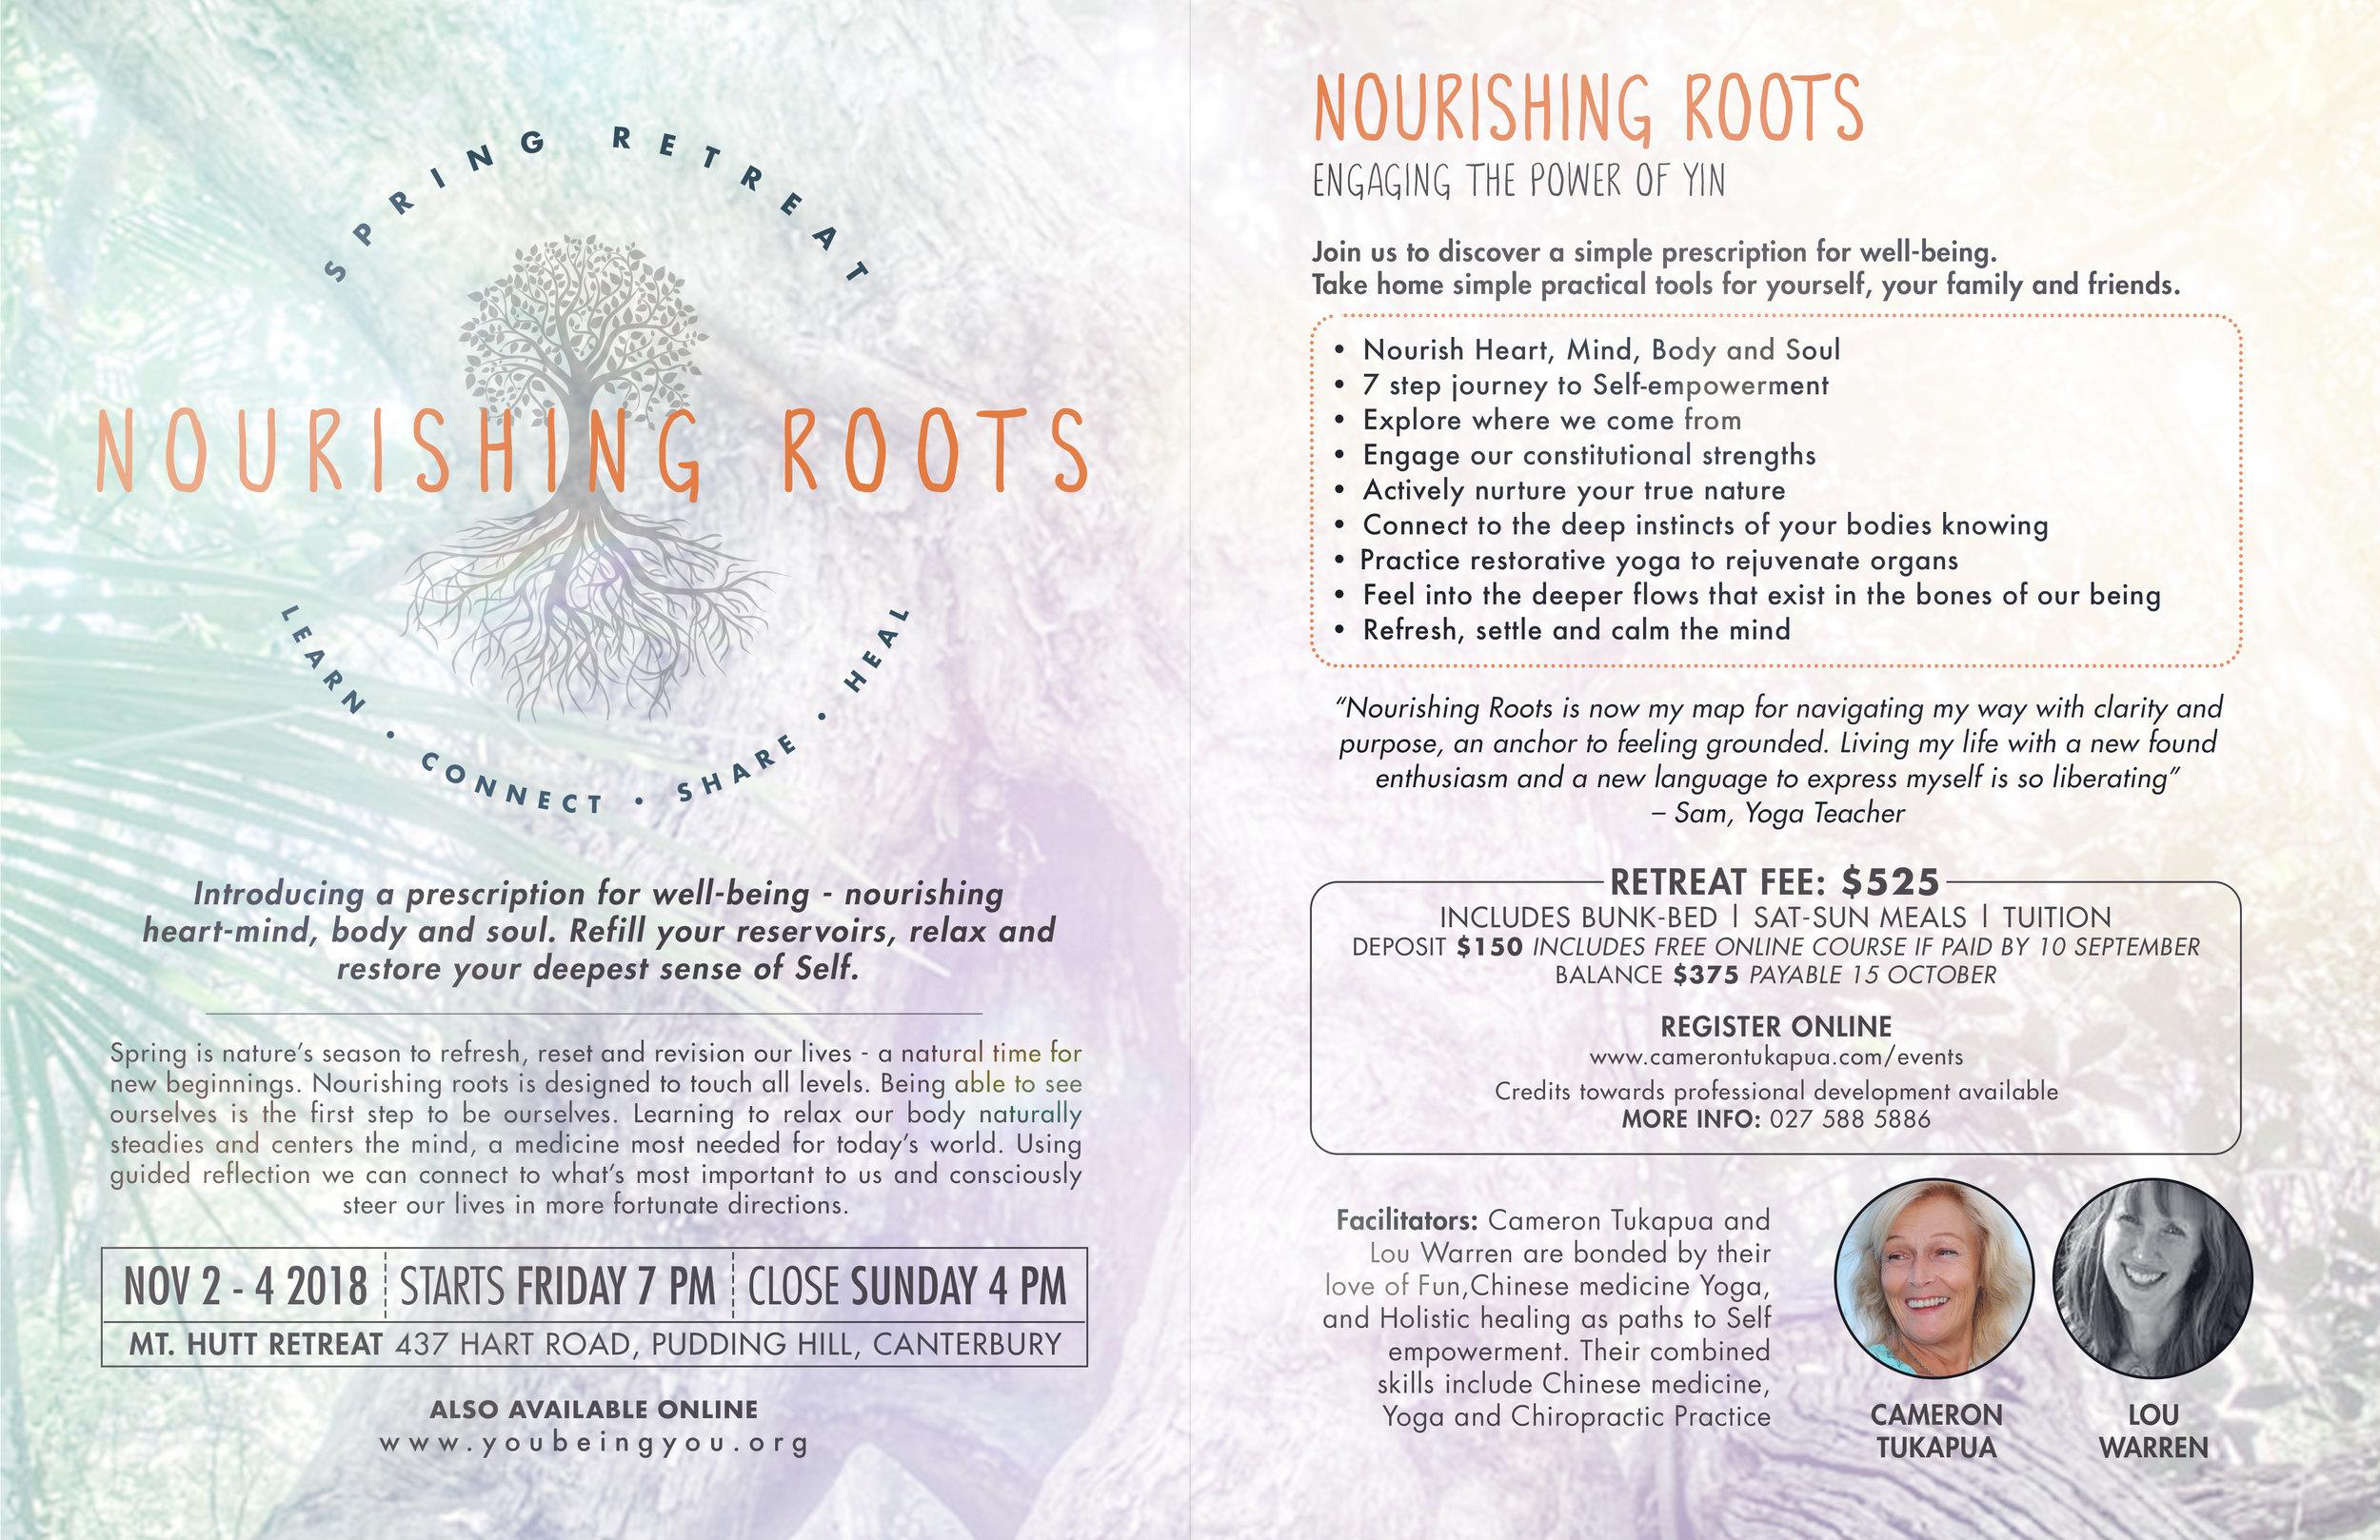 Nourishing Roots MT HUTT